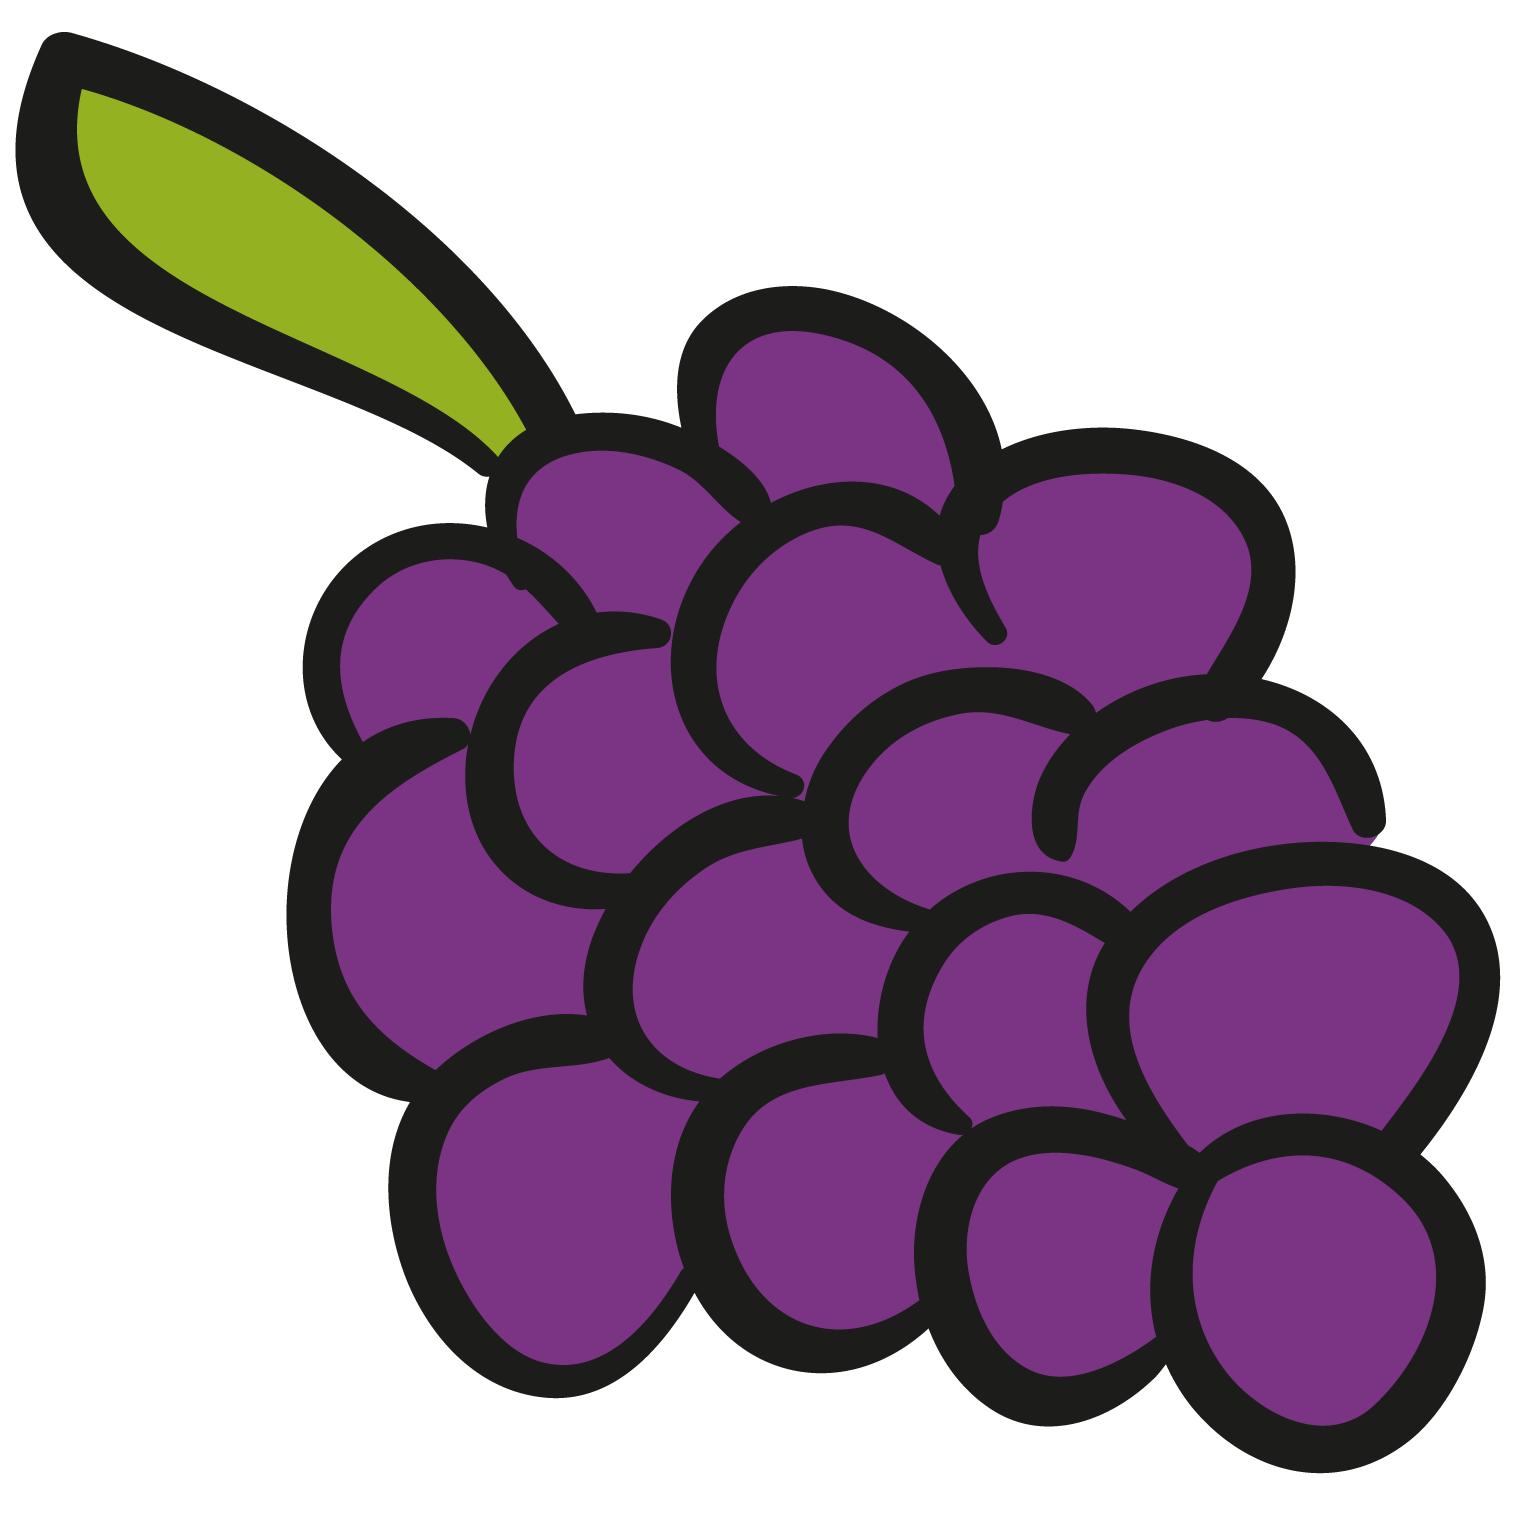 Grapes clipart violet. Grape animation illustration a